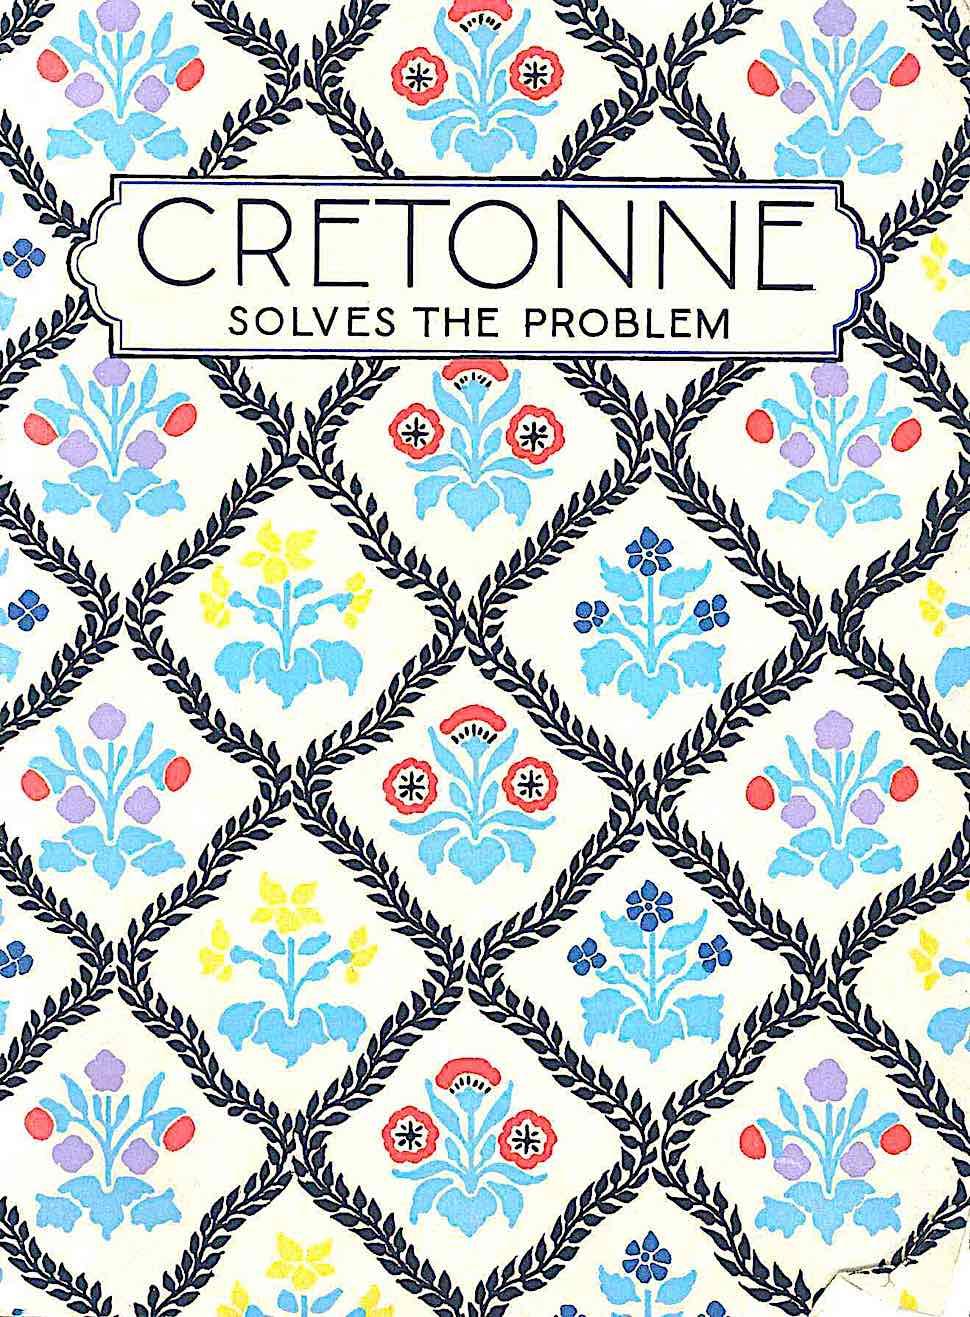 1925 printed Cretonne fabric in color